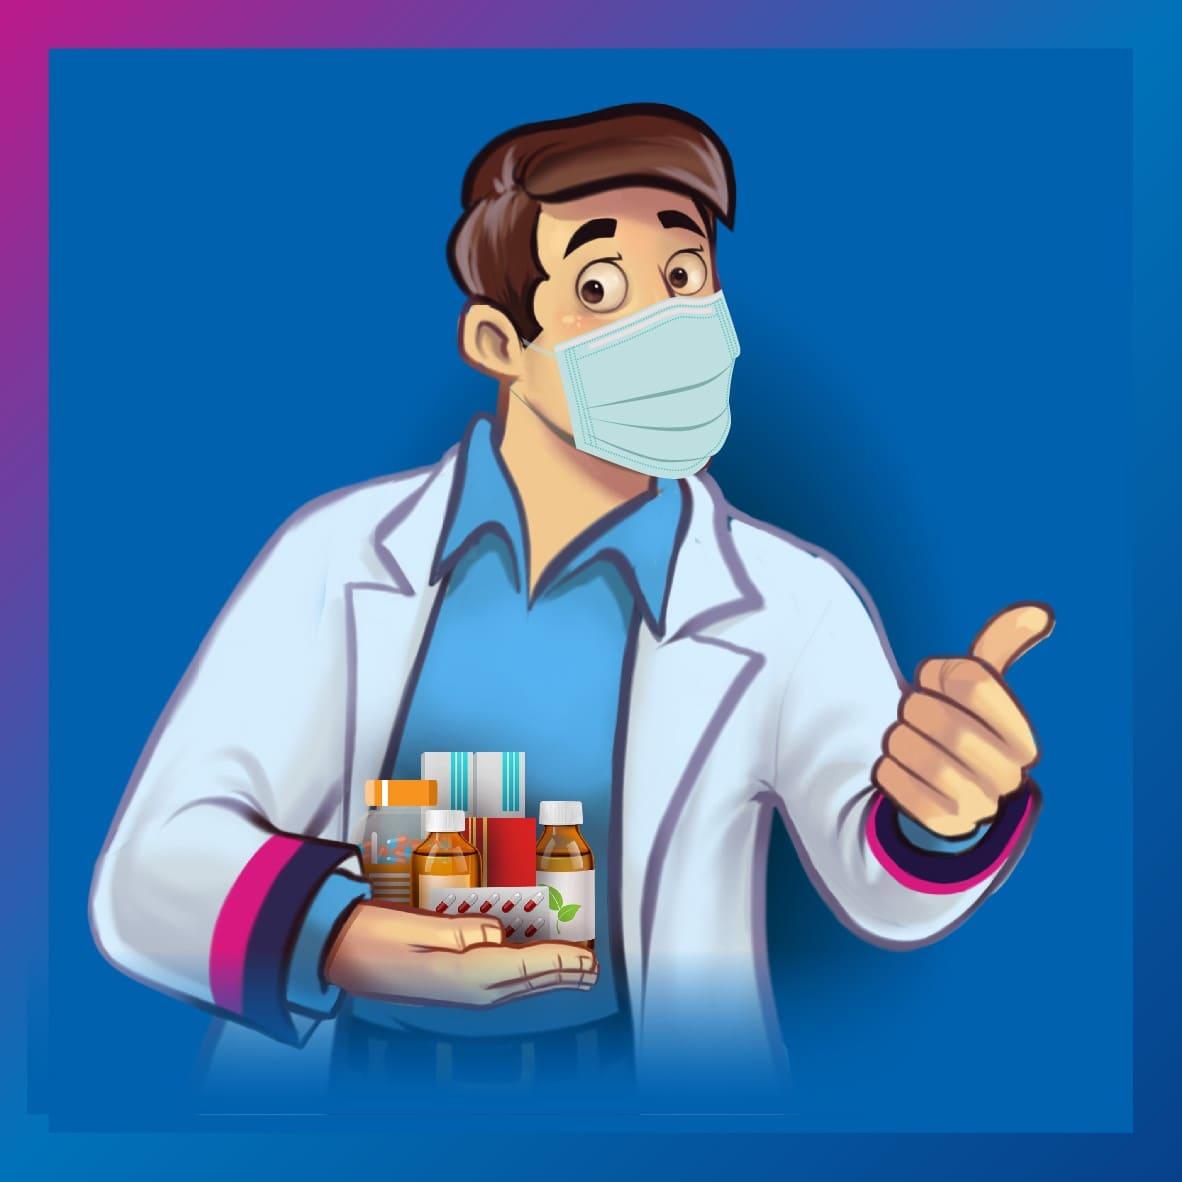 Clientes de Farmacias Cruz Azul podrán realizar pedidos desde sus casas para retirar